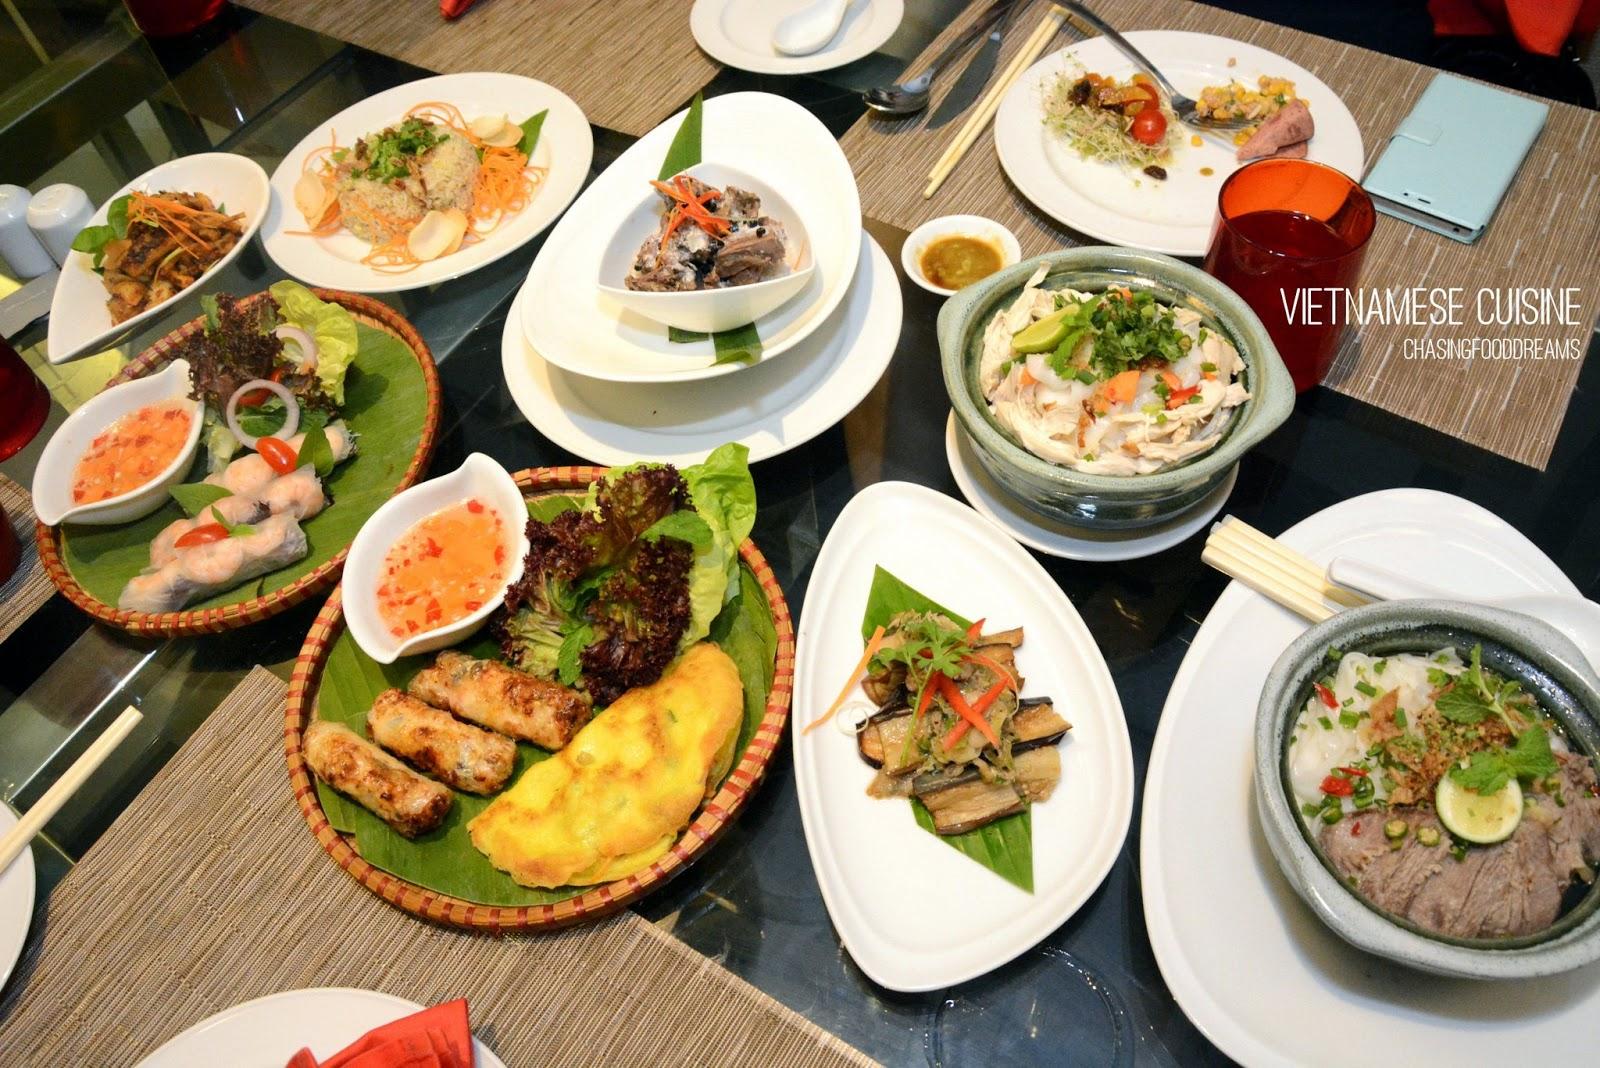 chasing food dreams link pullman kuala lumpur bangsar authentic vietnamese buffet promotion. Black Bedroom Furniture Sets. Home Design Ideas